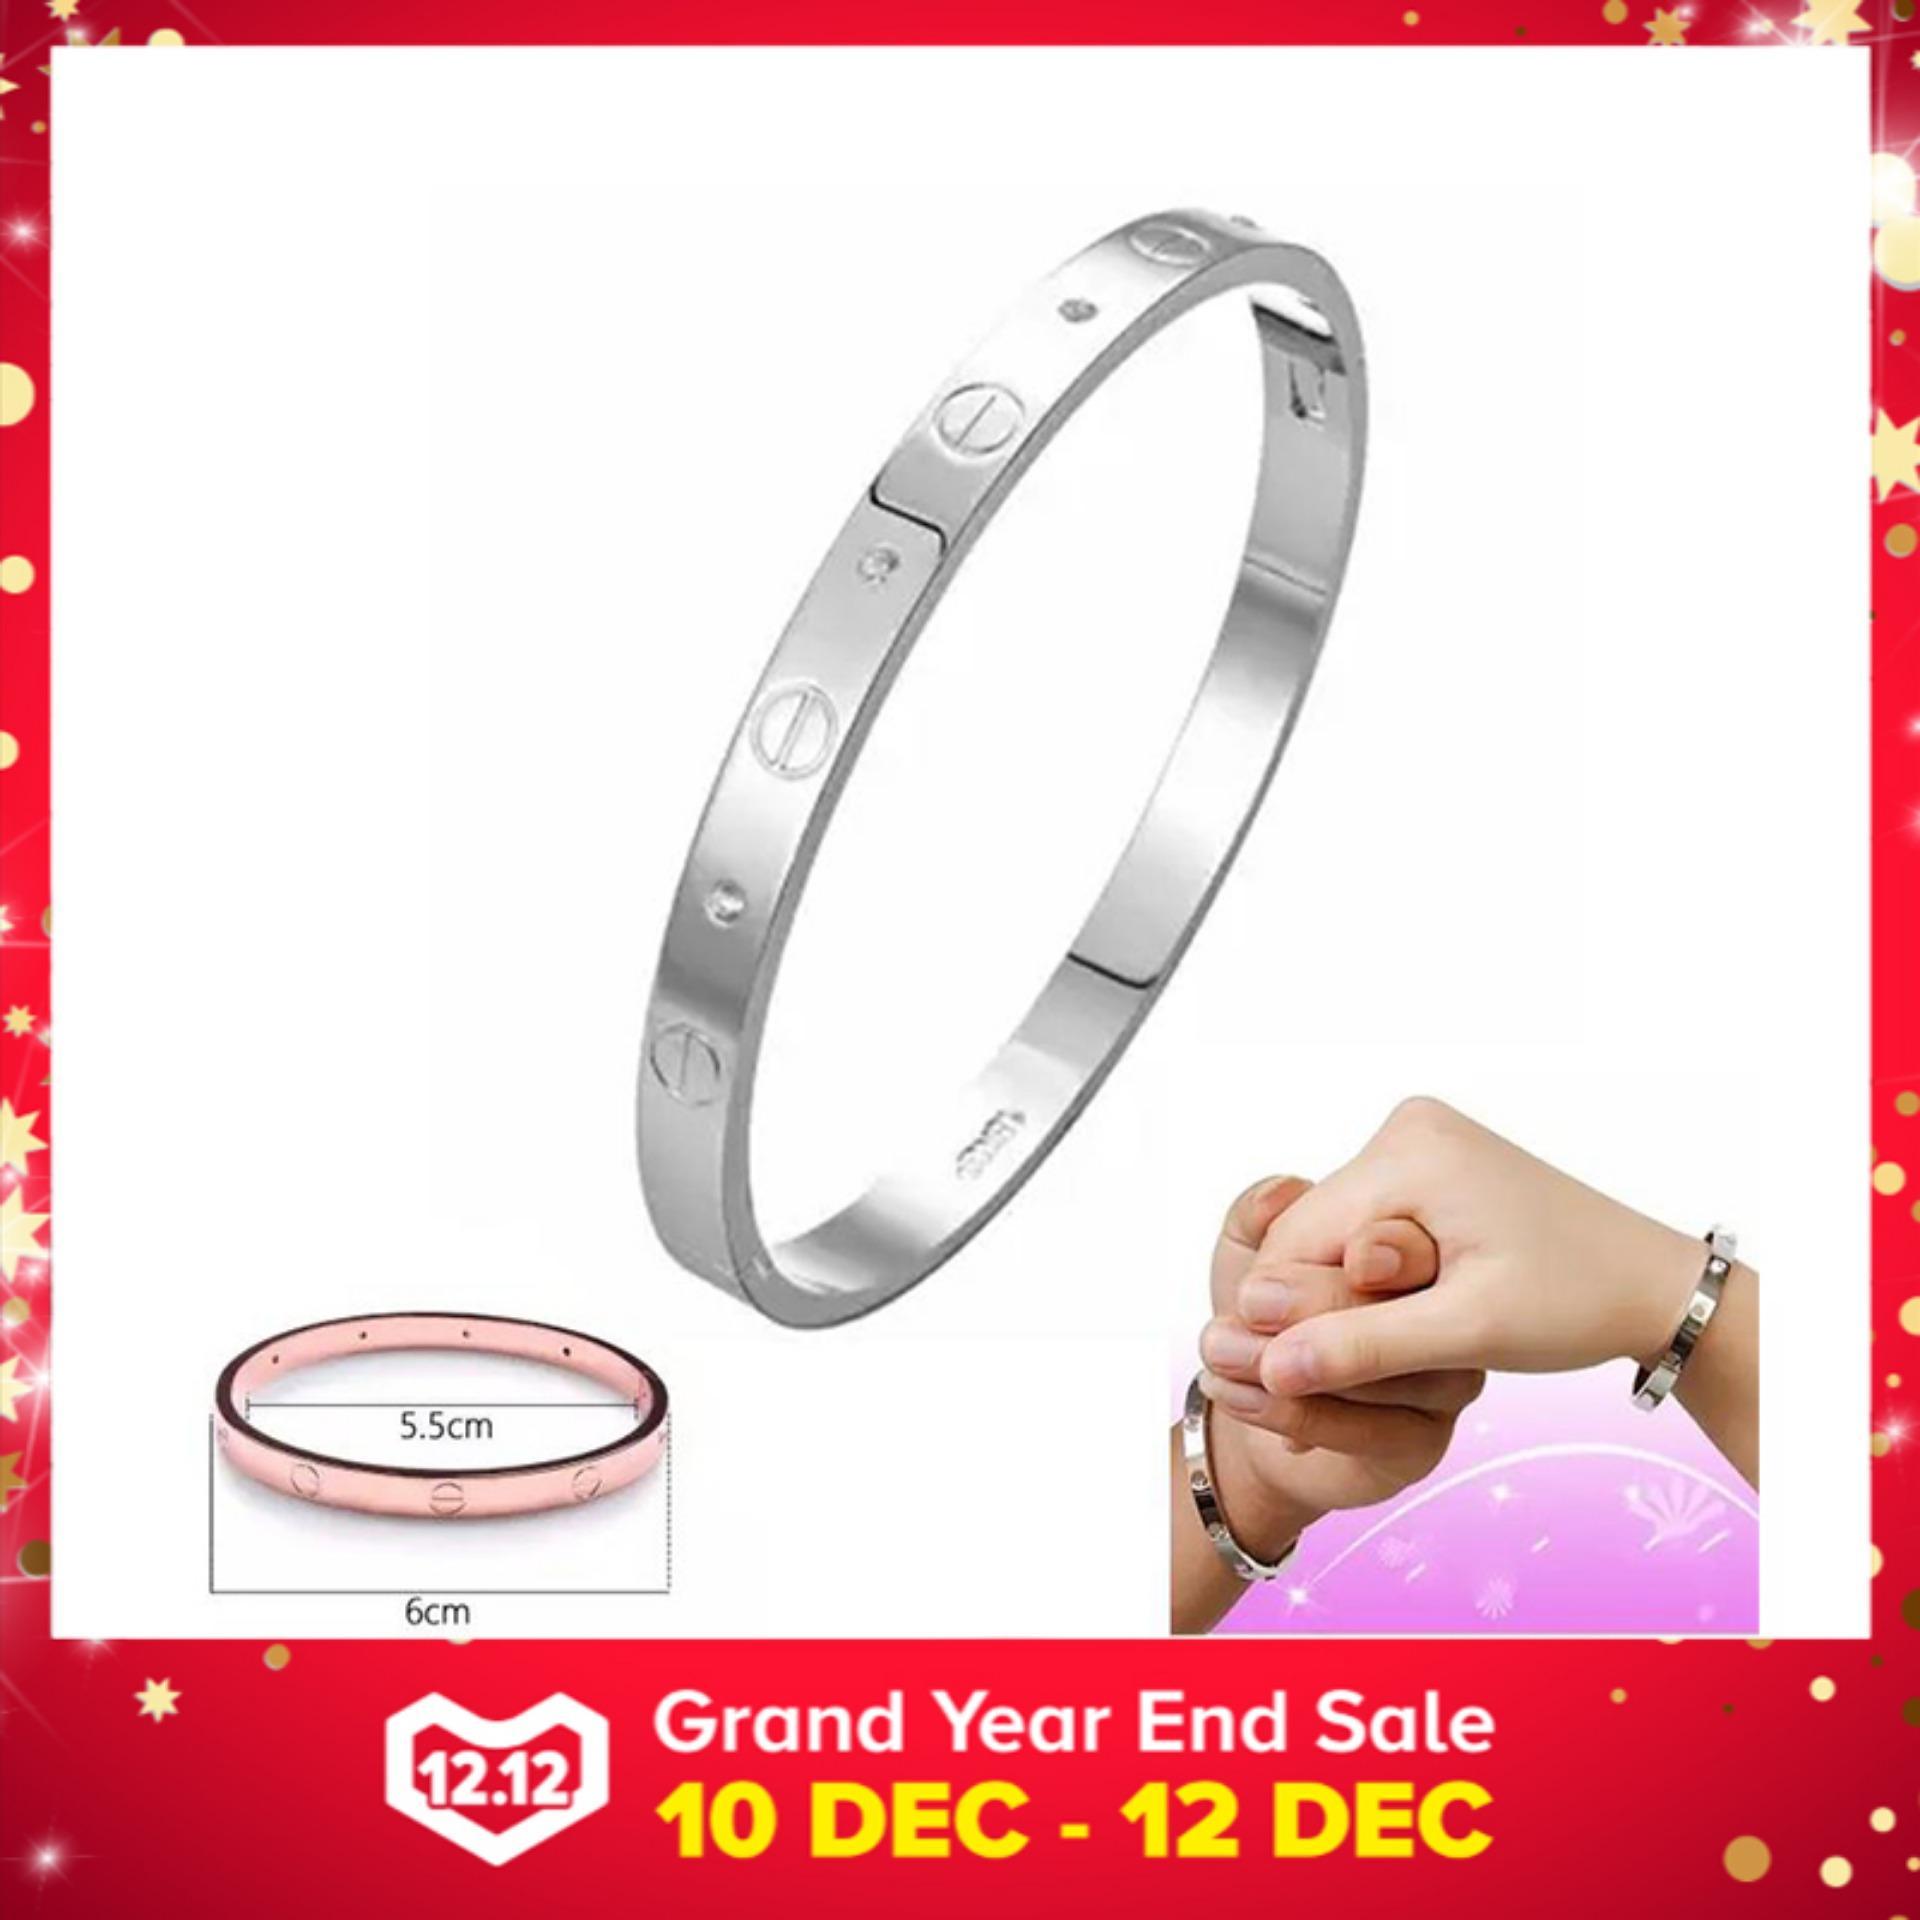 Women's Fashion Jewellery Stainless Steel Screw Rhinestone Titanium Bangle Charm Bracelet for Love